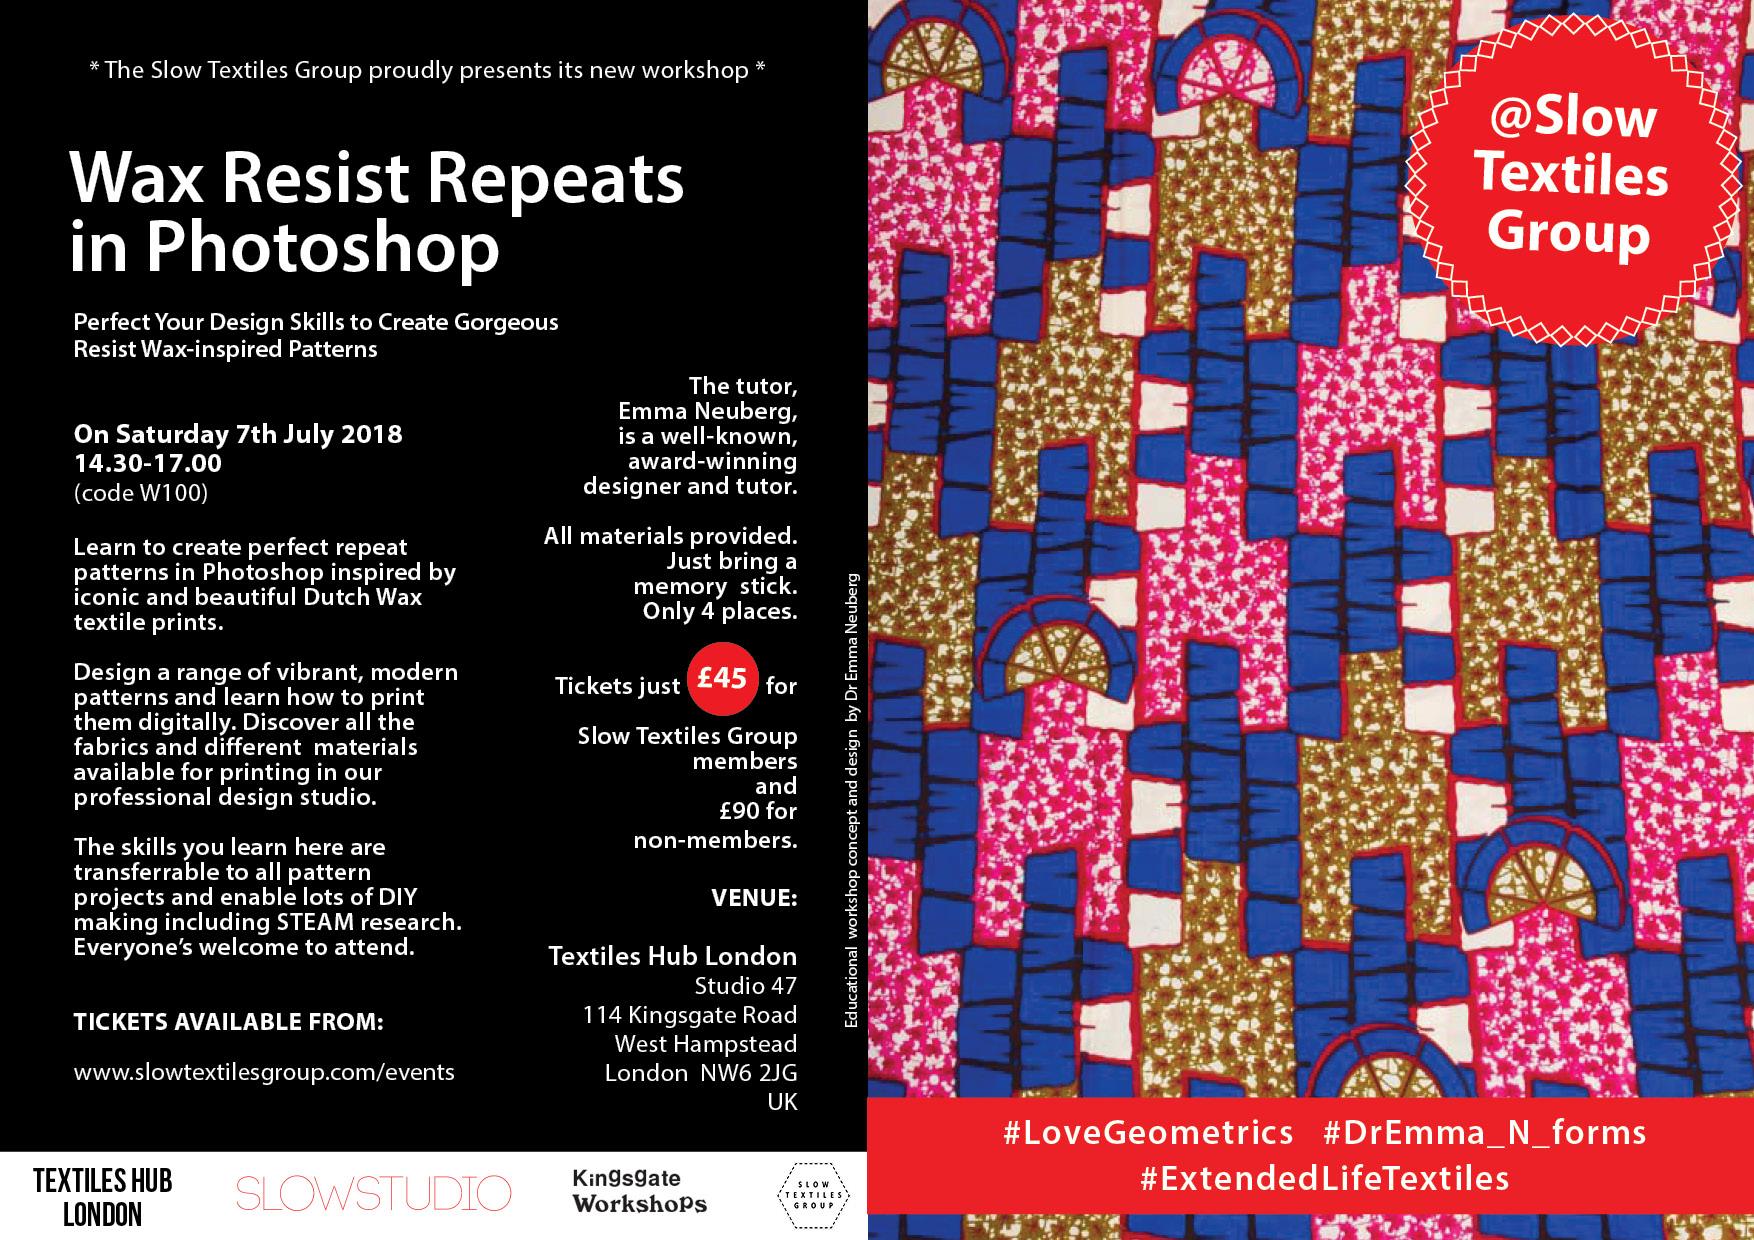 Slow Textiles Group Design Workshop 100 (code W100)